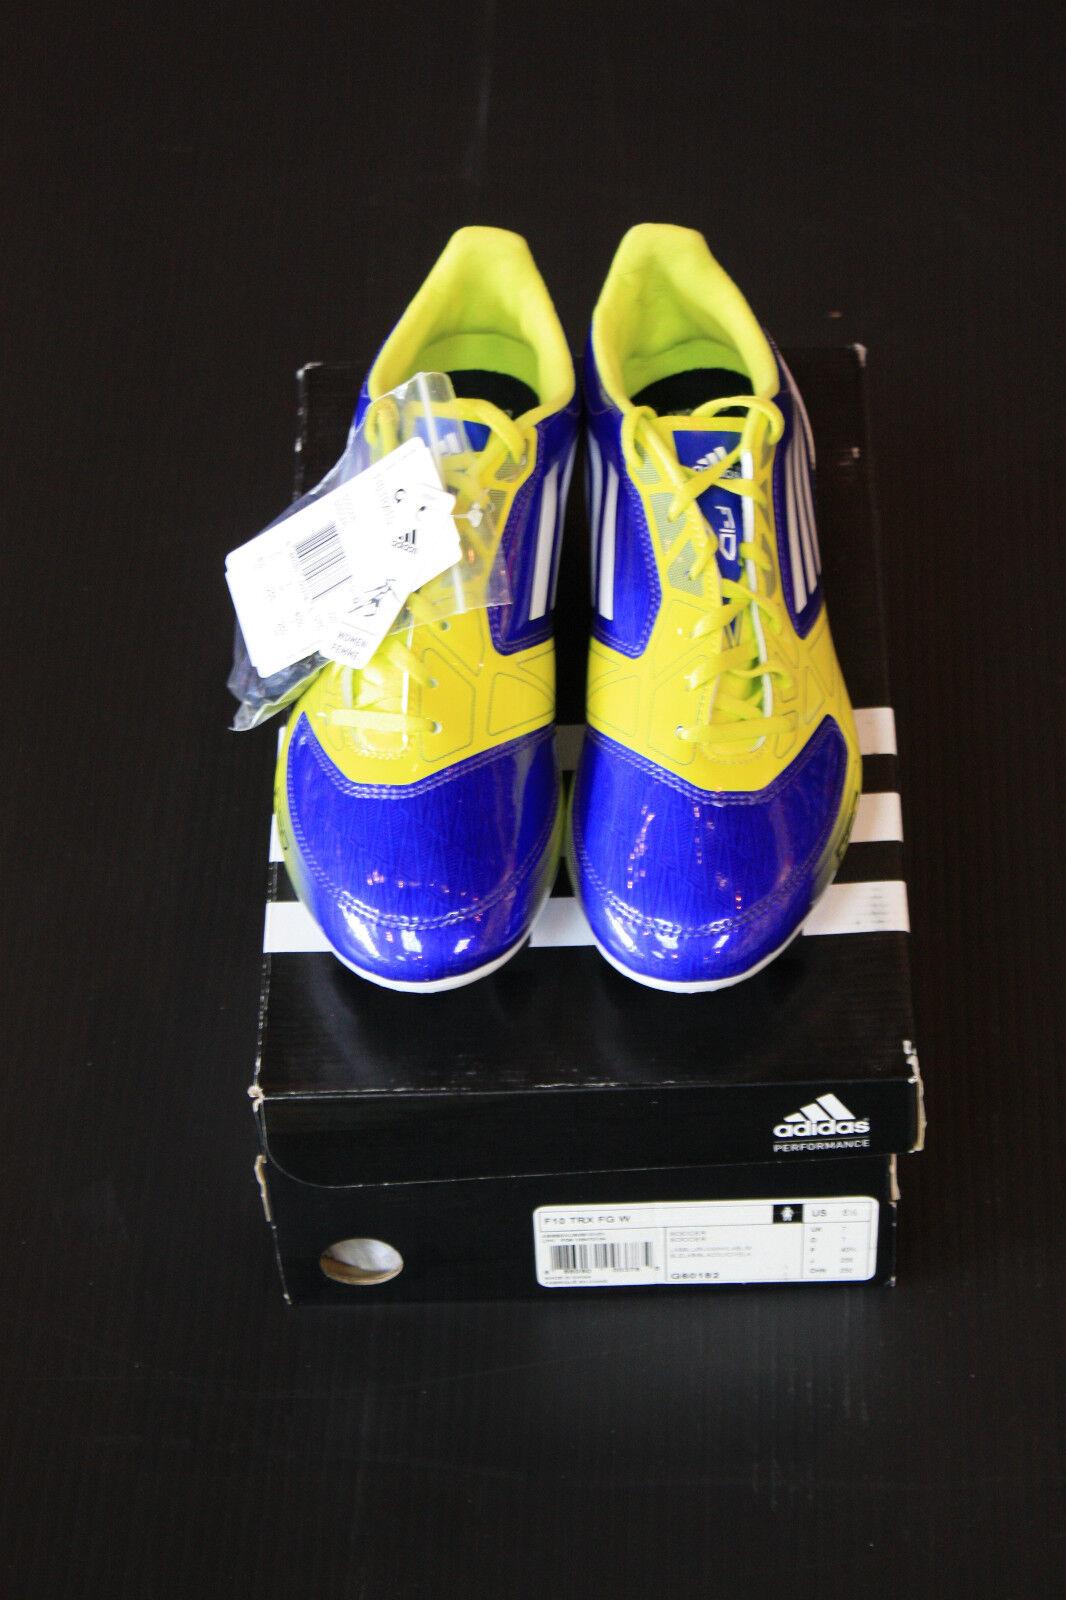 adidas F10 FG ΓυναικΡίο - Νέο ΞΌΞ΅ ανταλλακτικά κορδόνια ΞΊΞ±ΞΉ κουτί - 45% έκπτωση λιανικΞ�Ο' !!!!!